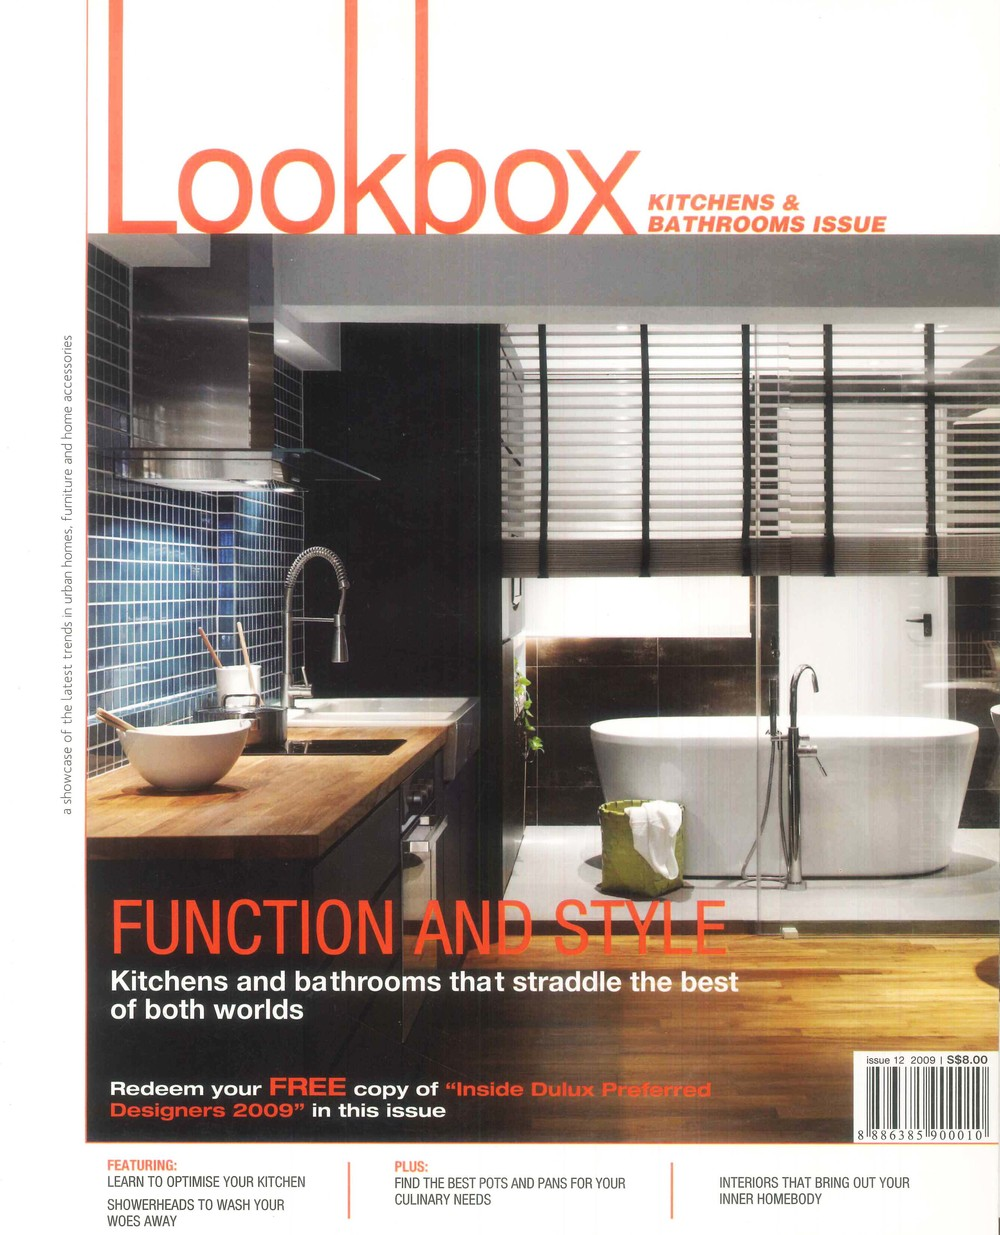 LOOKBOX KITCHEN & BATHROOMS 2 COVER.jpg